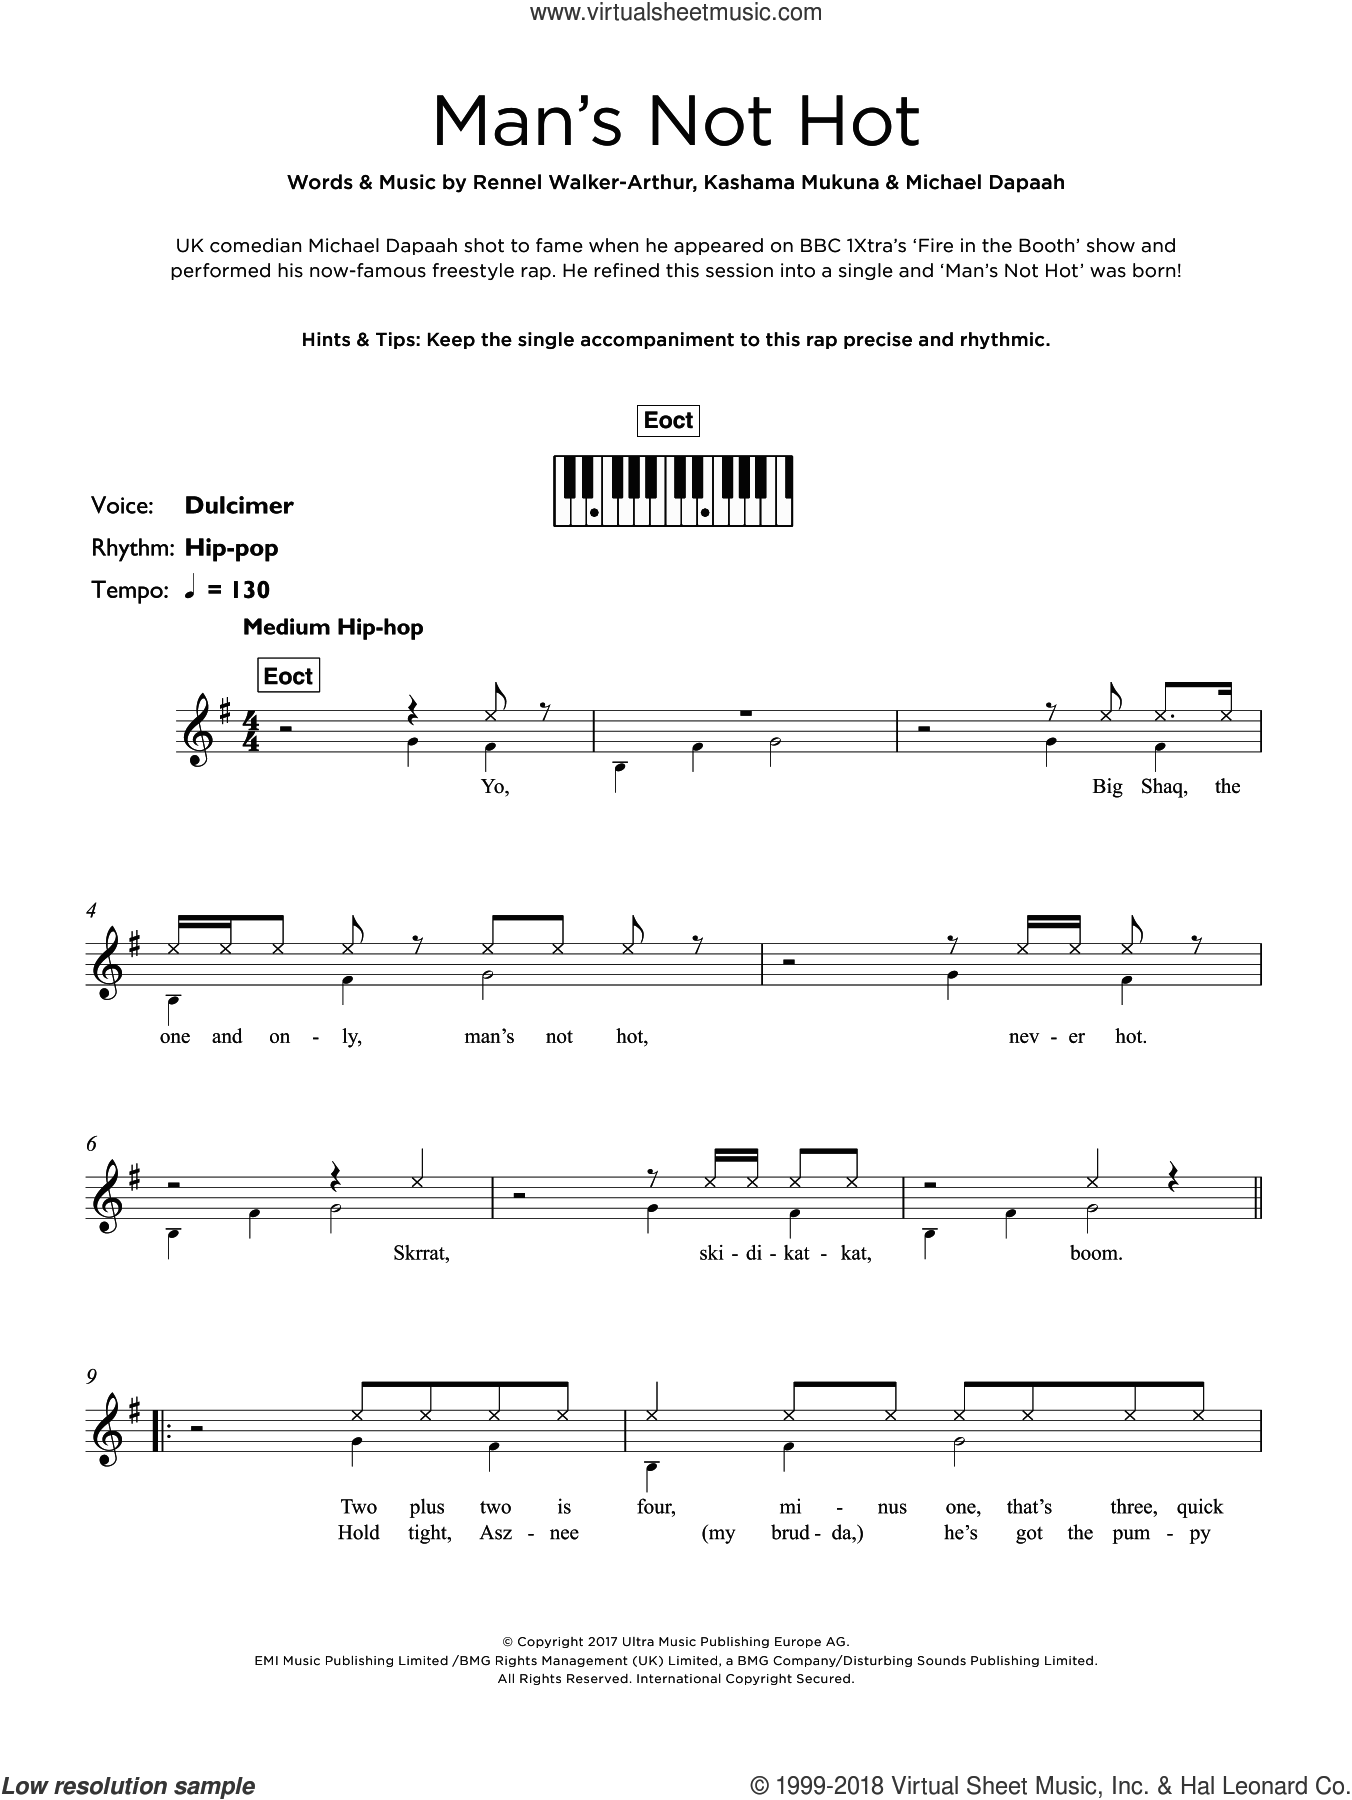 Man's Not Hot sheet music for piano solo (keyboard) by Big Shaq, Kashama Mukuna, Michael Dapaah and Rennel Walker-Arthur, intermediate piano (keyboard)